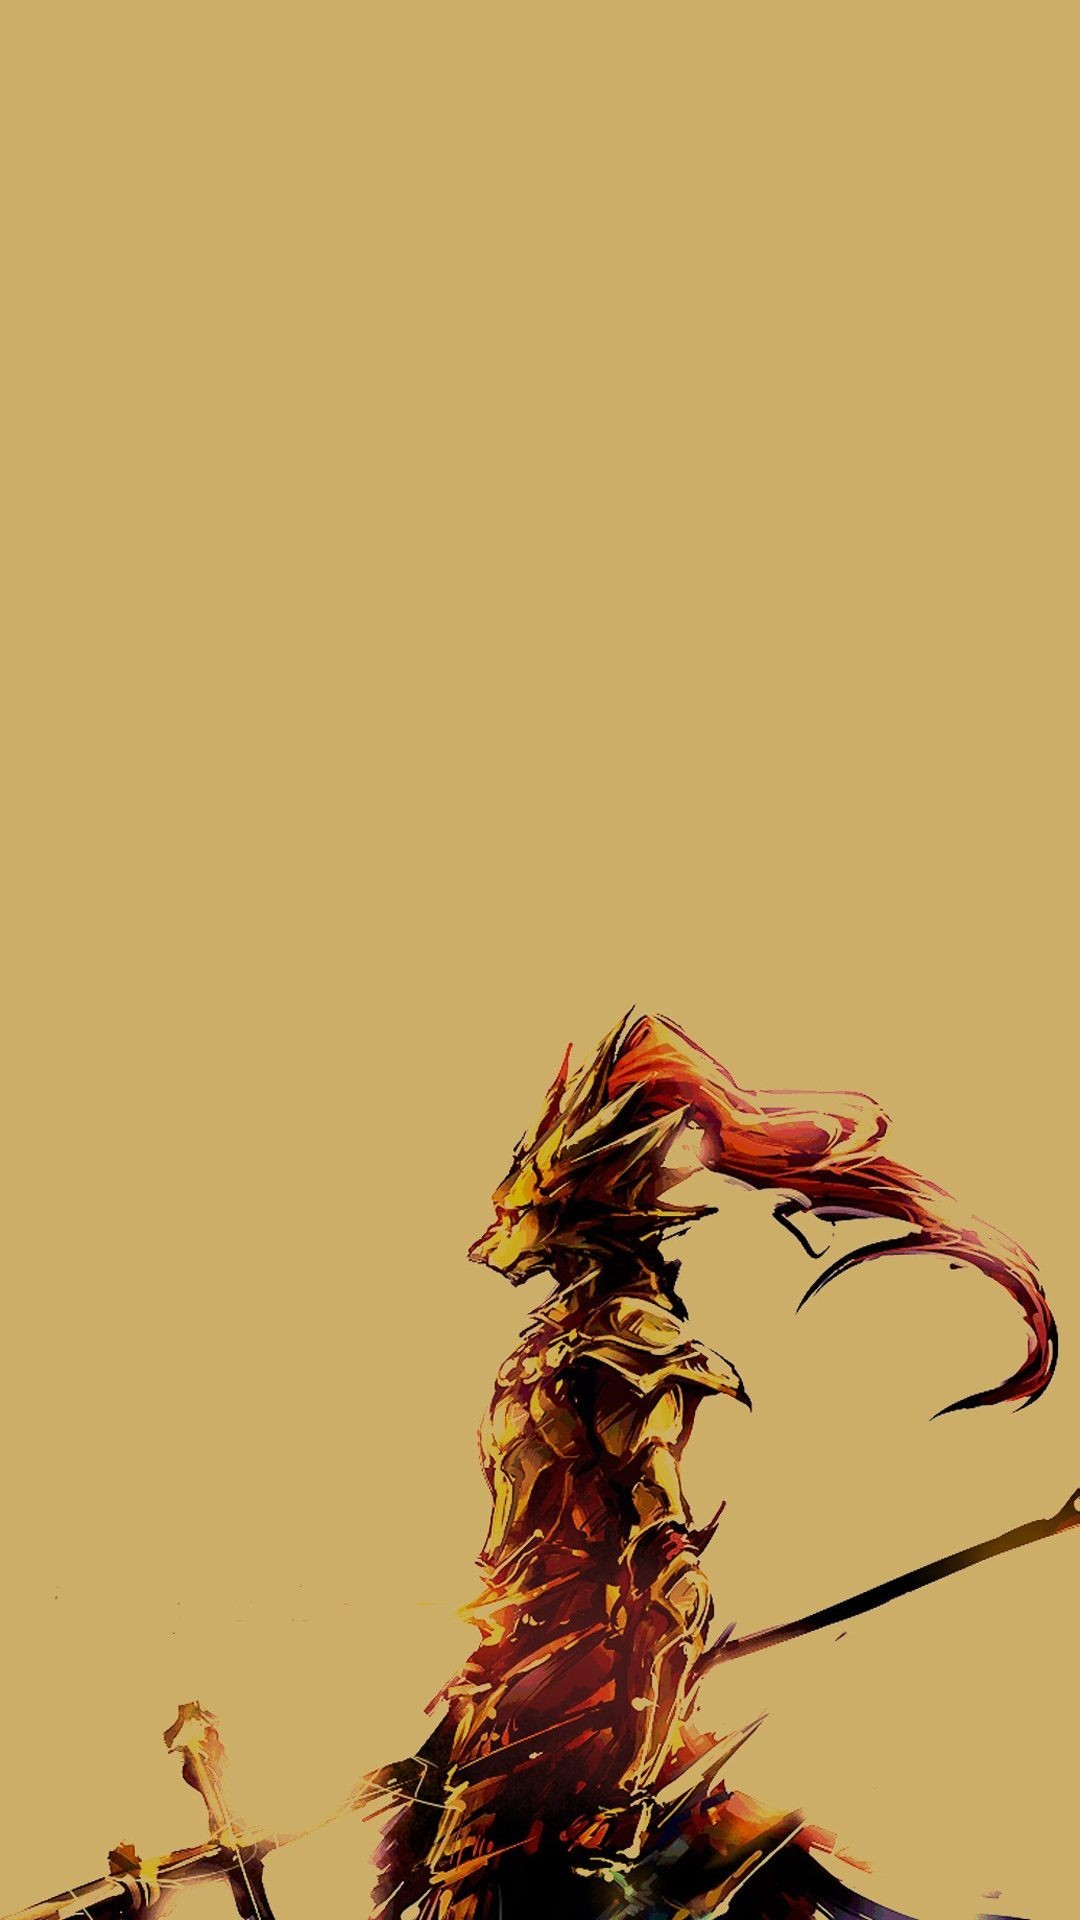 Dark Souls Iphone X Wallpaper